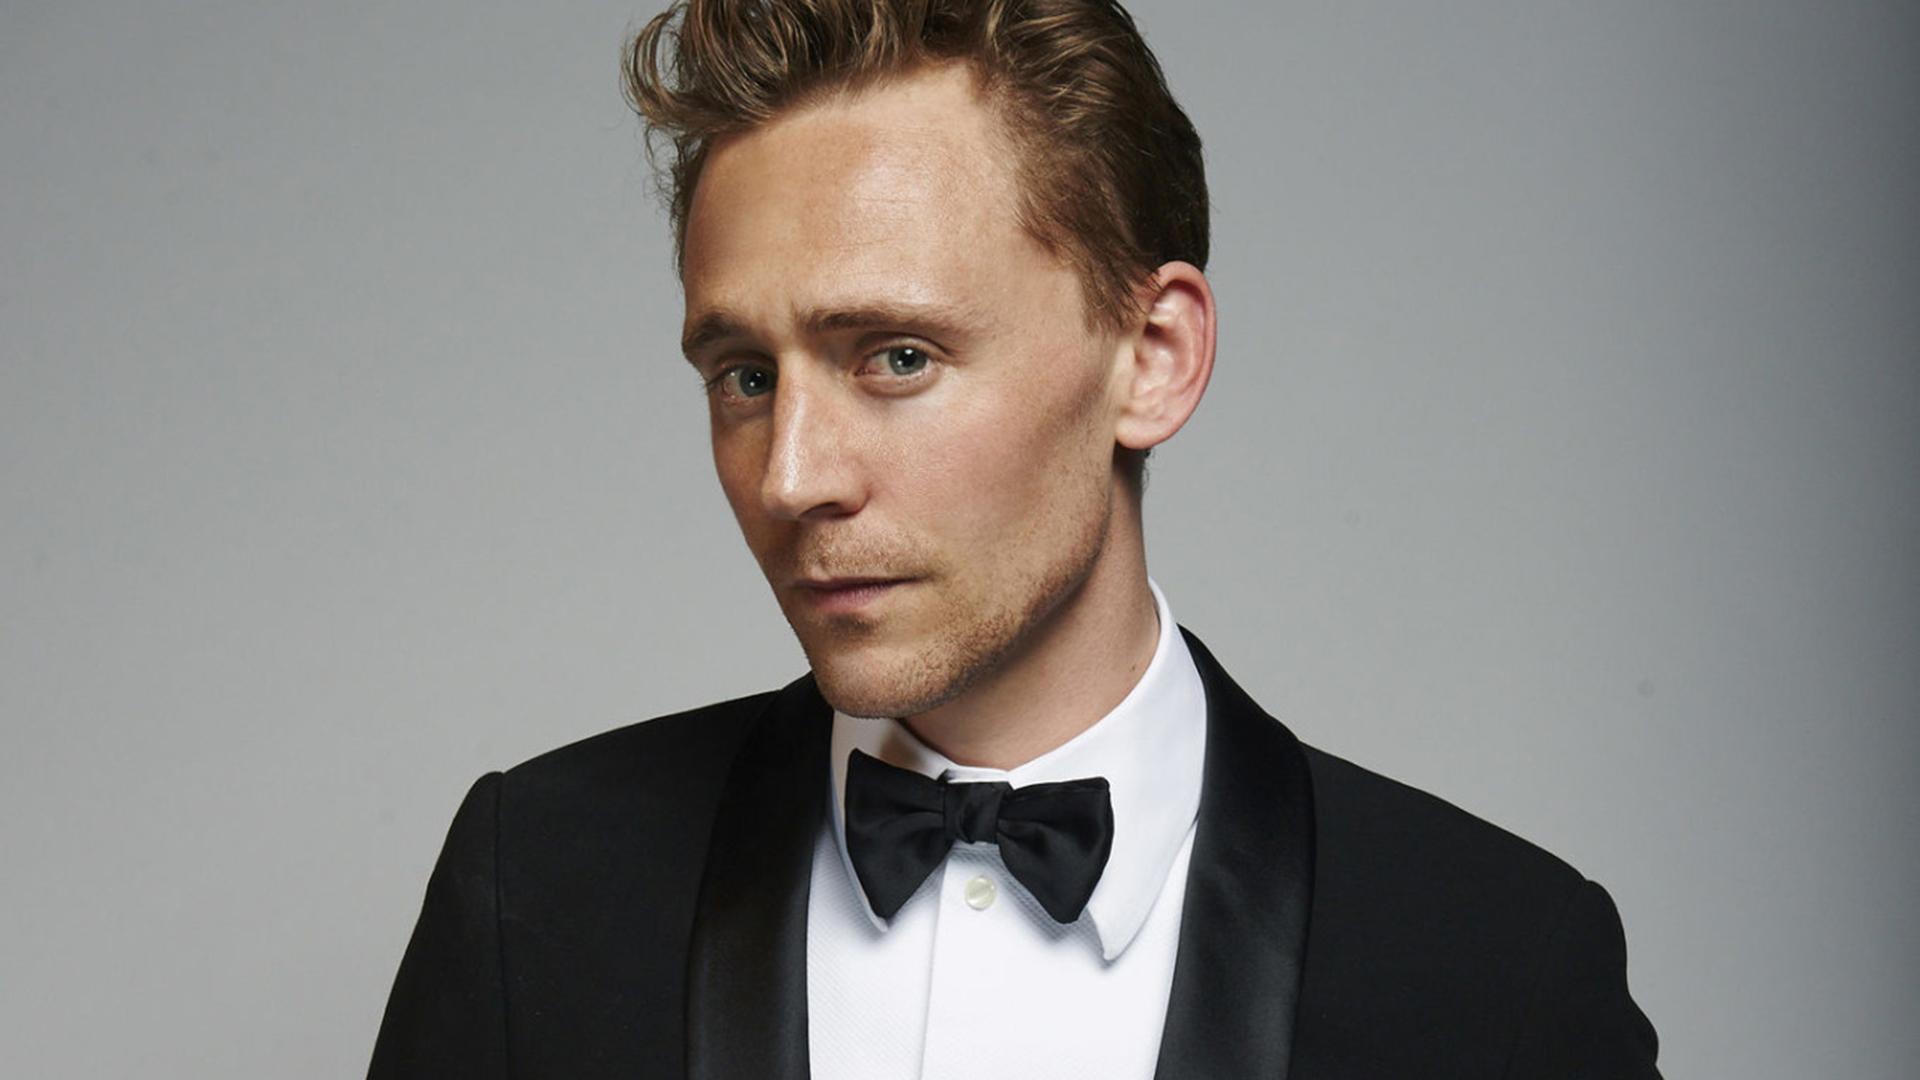 Tom Hiddleston Wallpaper   HD HdCoolWallpapersCom 1920x1080